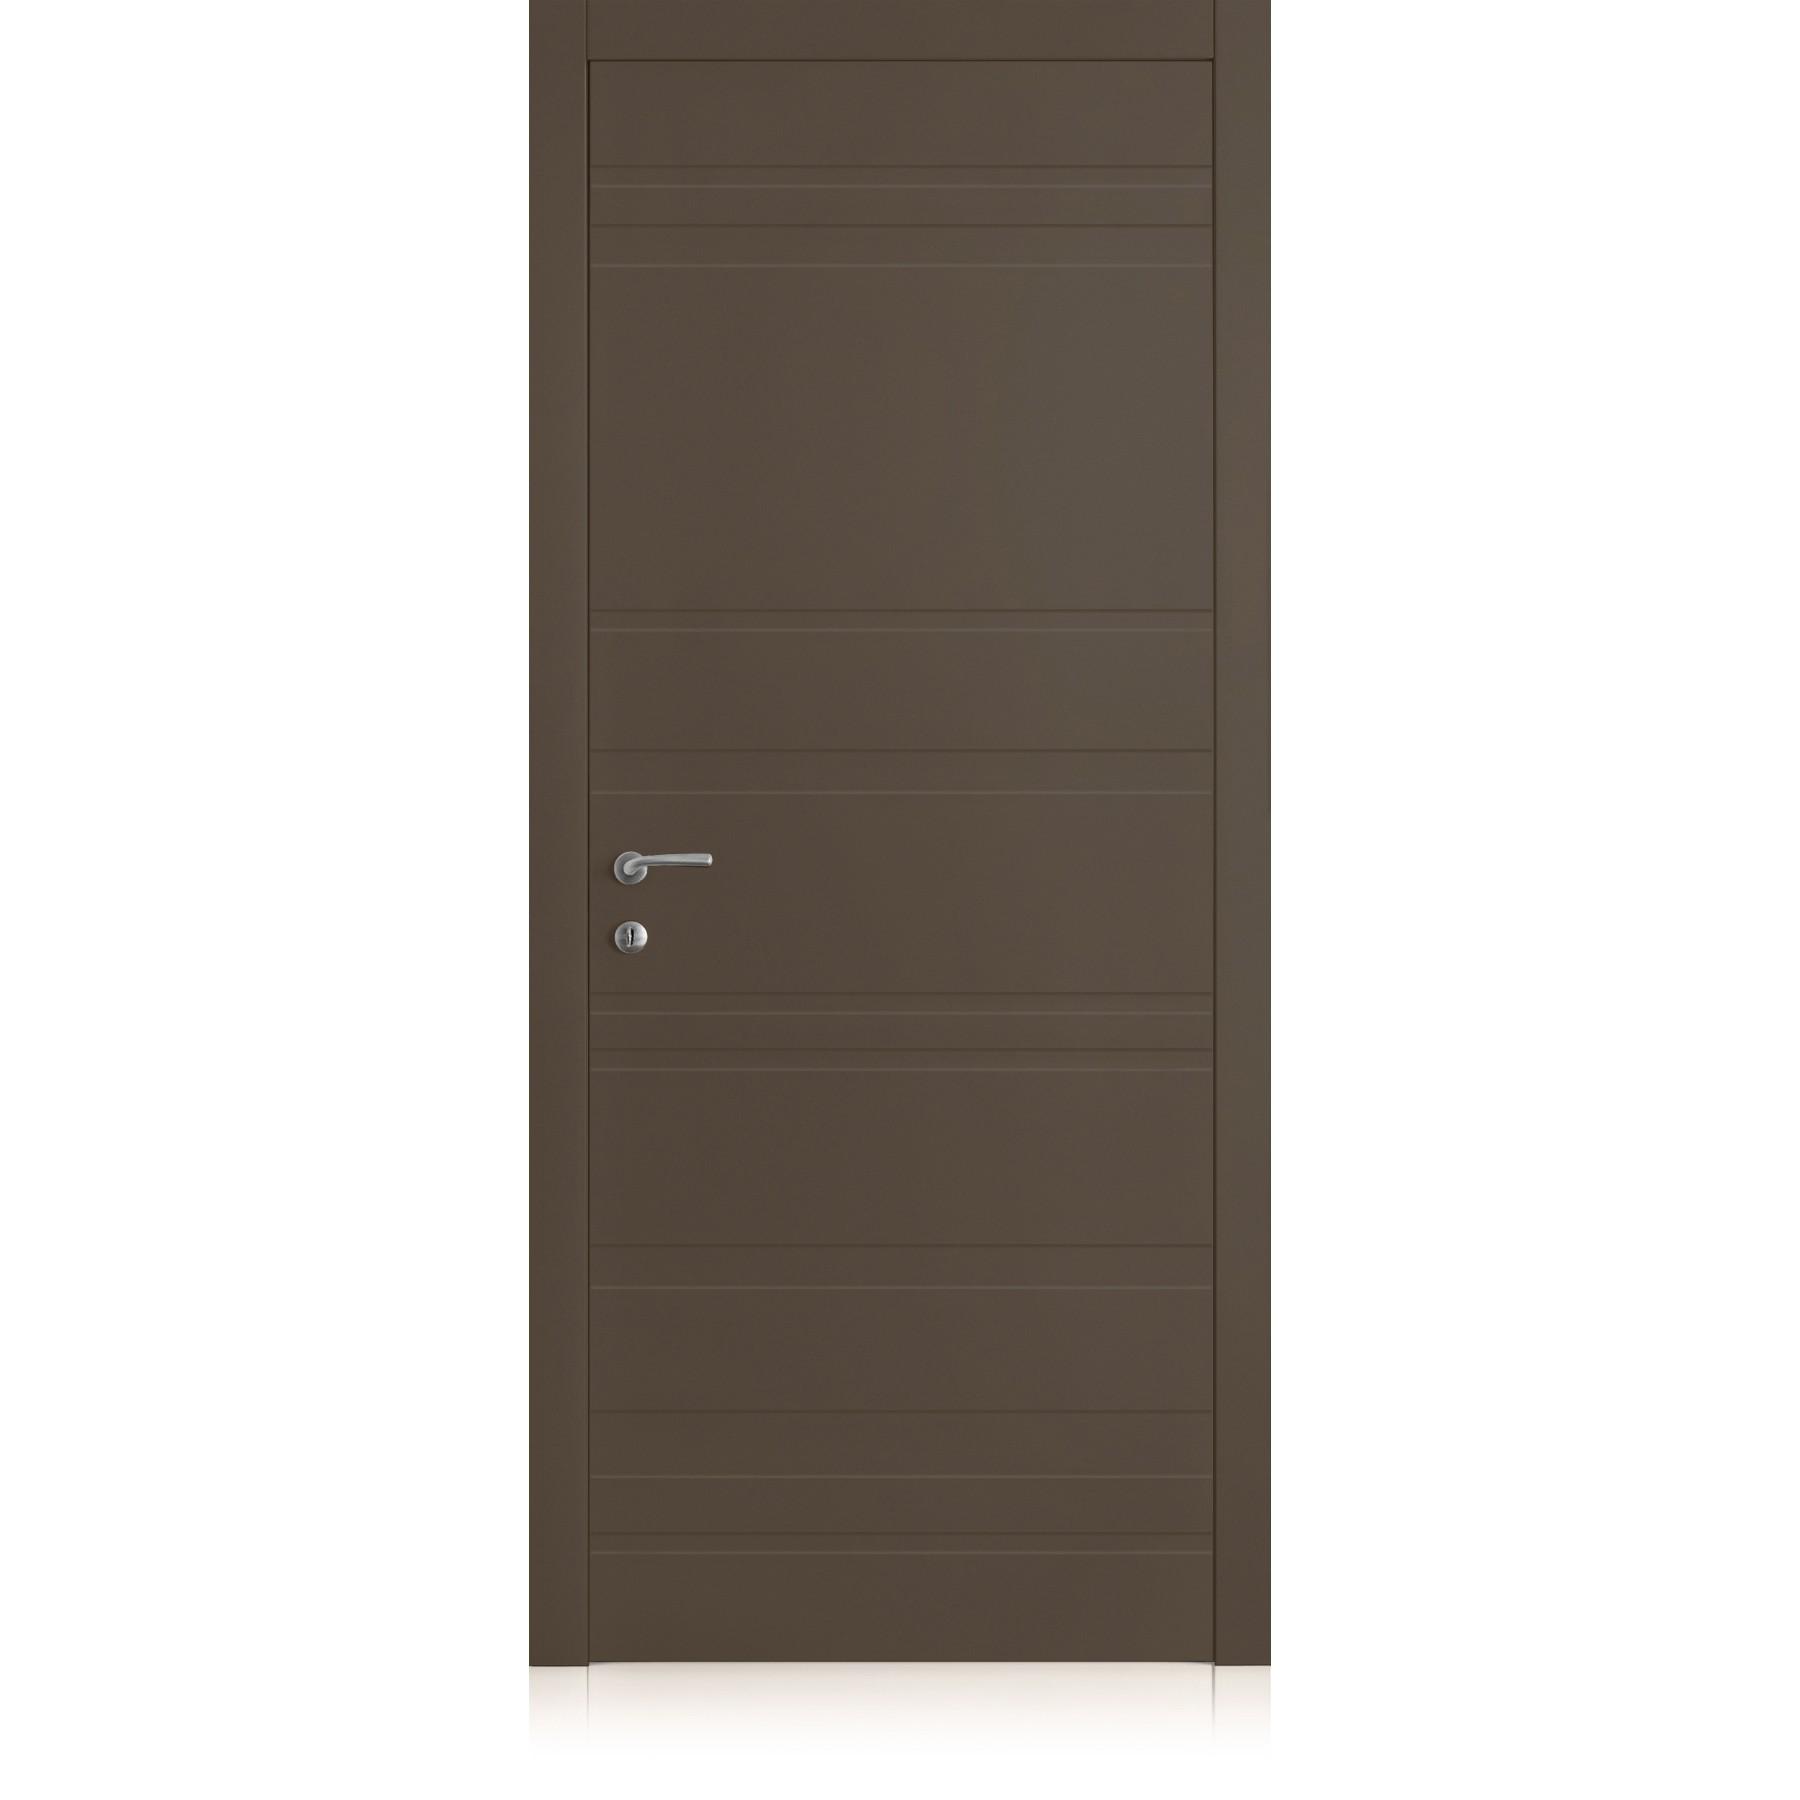 Porta Yncisa Styla Ombra Dark Laccato ULTRAopaco